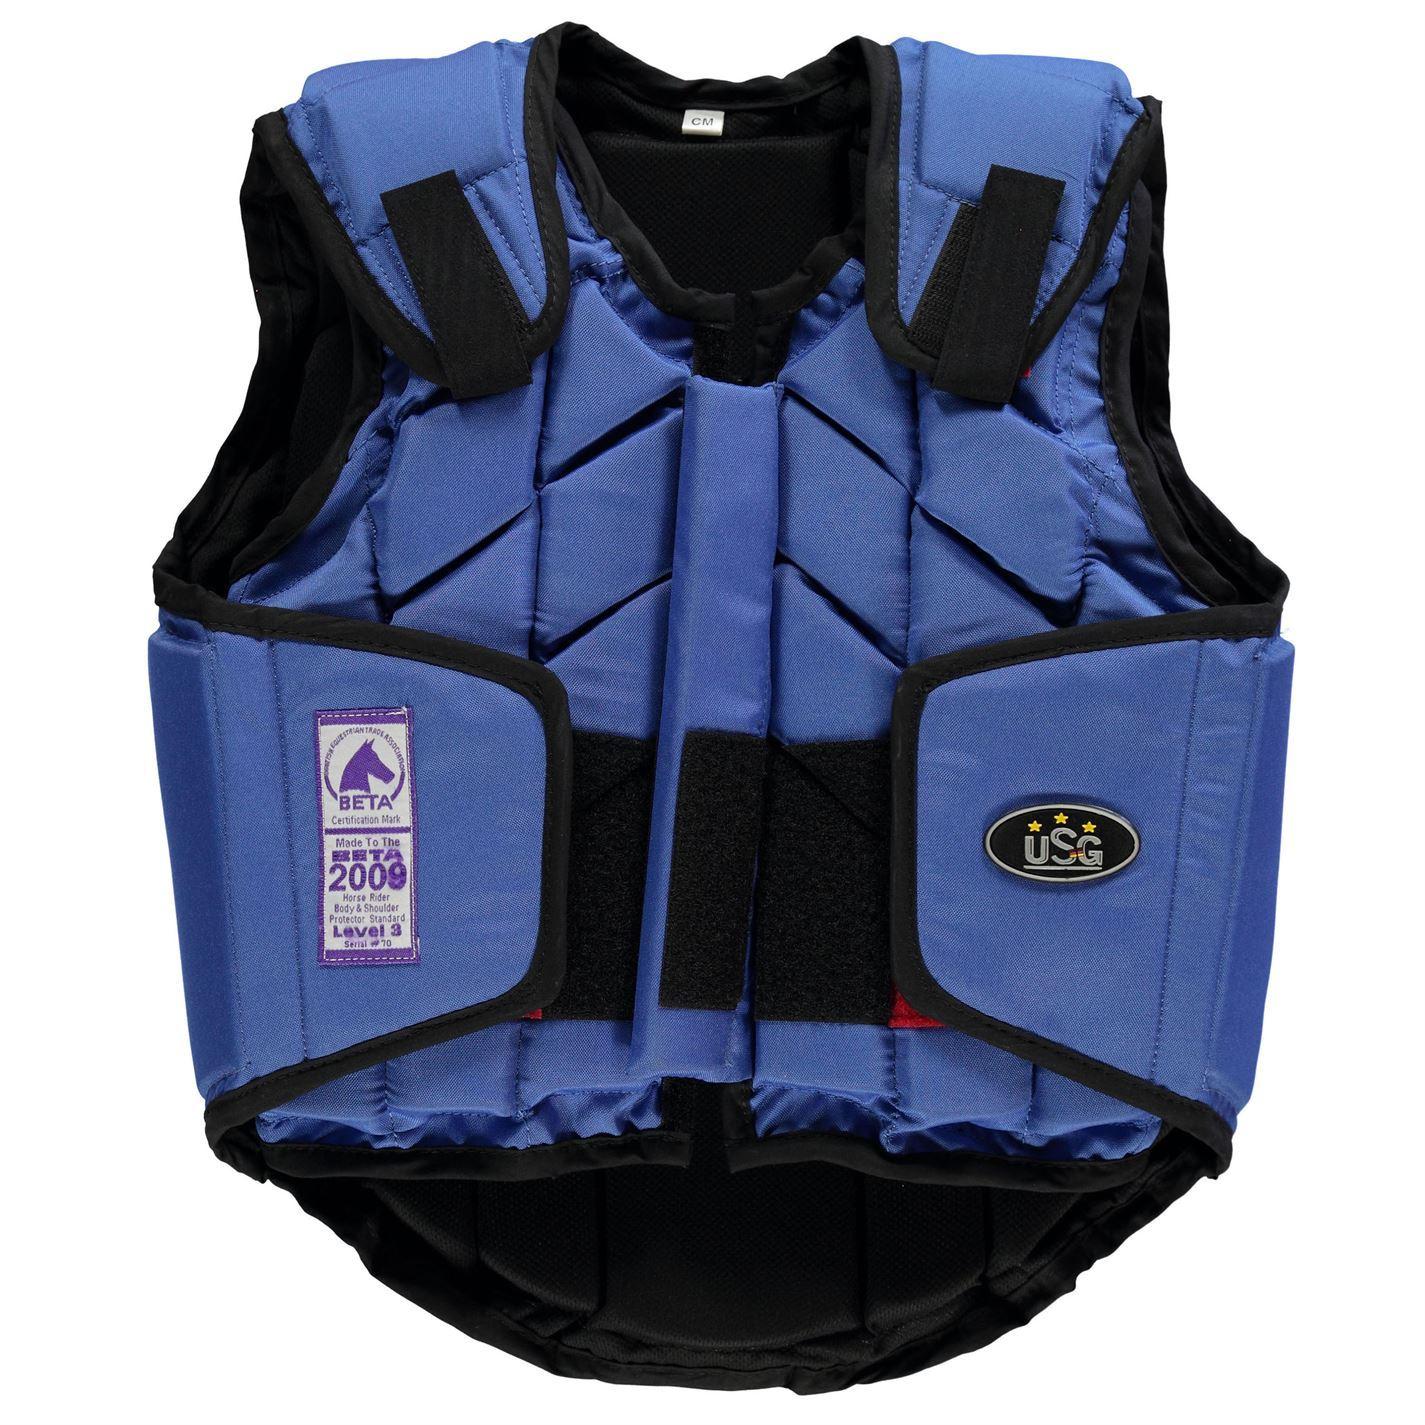 USG Niños Eco Flexi Cuerpo Protector Juniors Cremallera Rider Protección Cremallera Juniors caballos ae2c5e